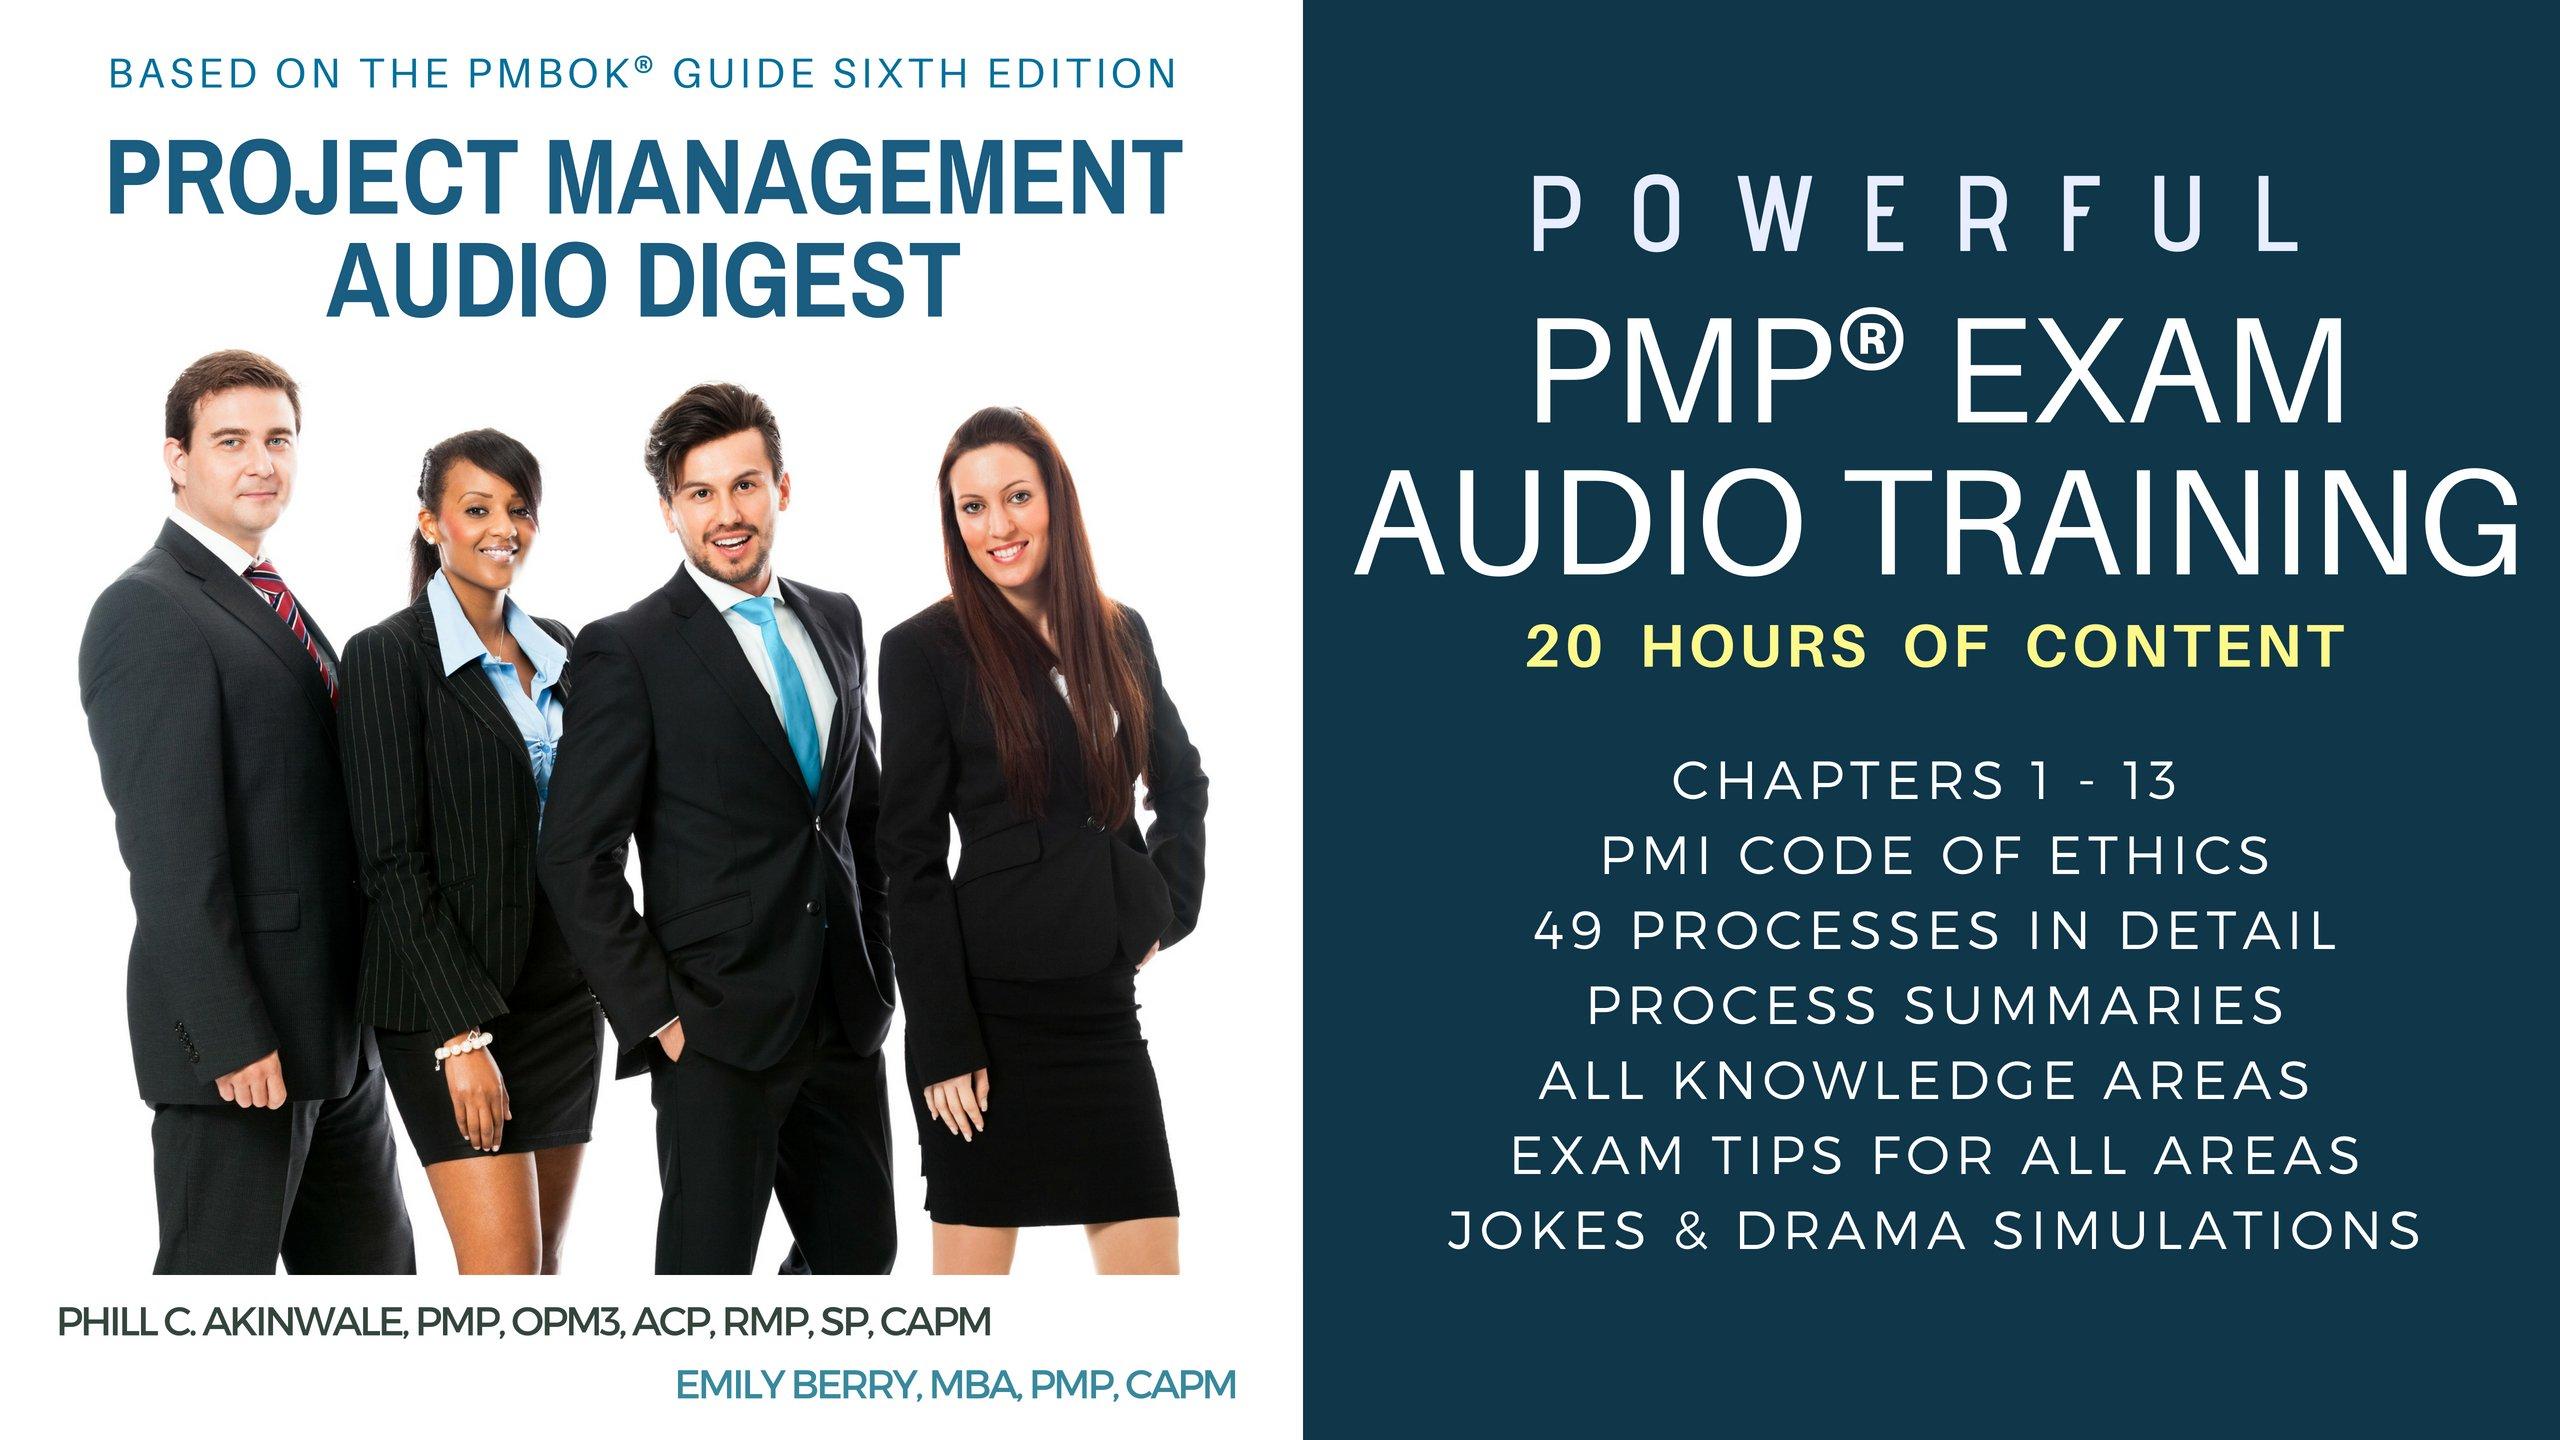 Project Management Audio Digest (20HR 24CD PMBOK Guide Sixth